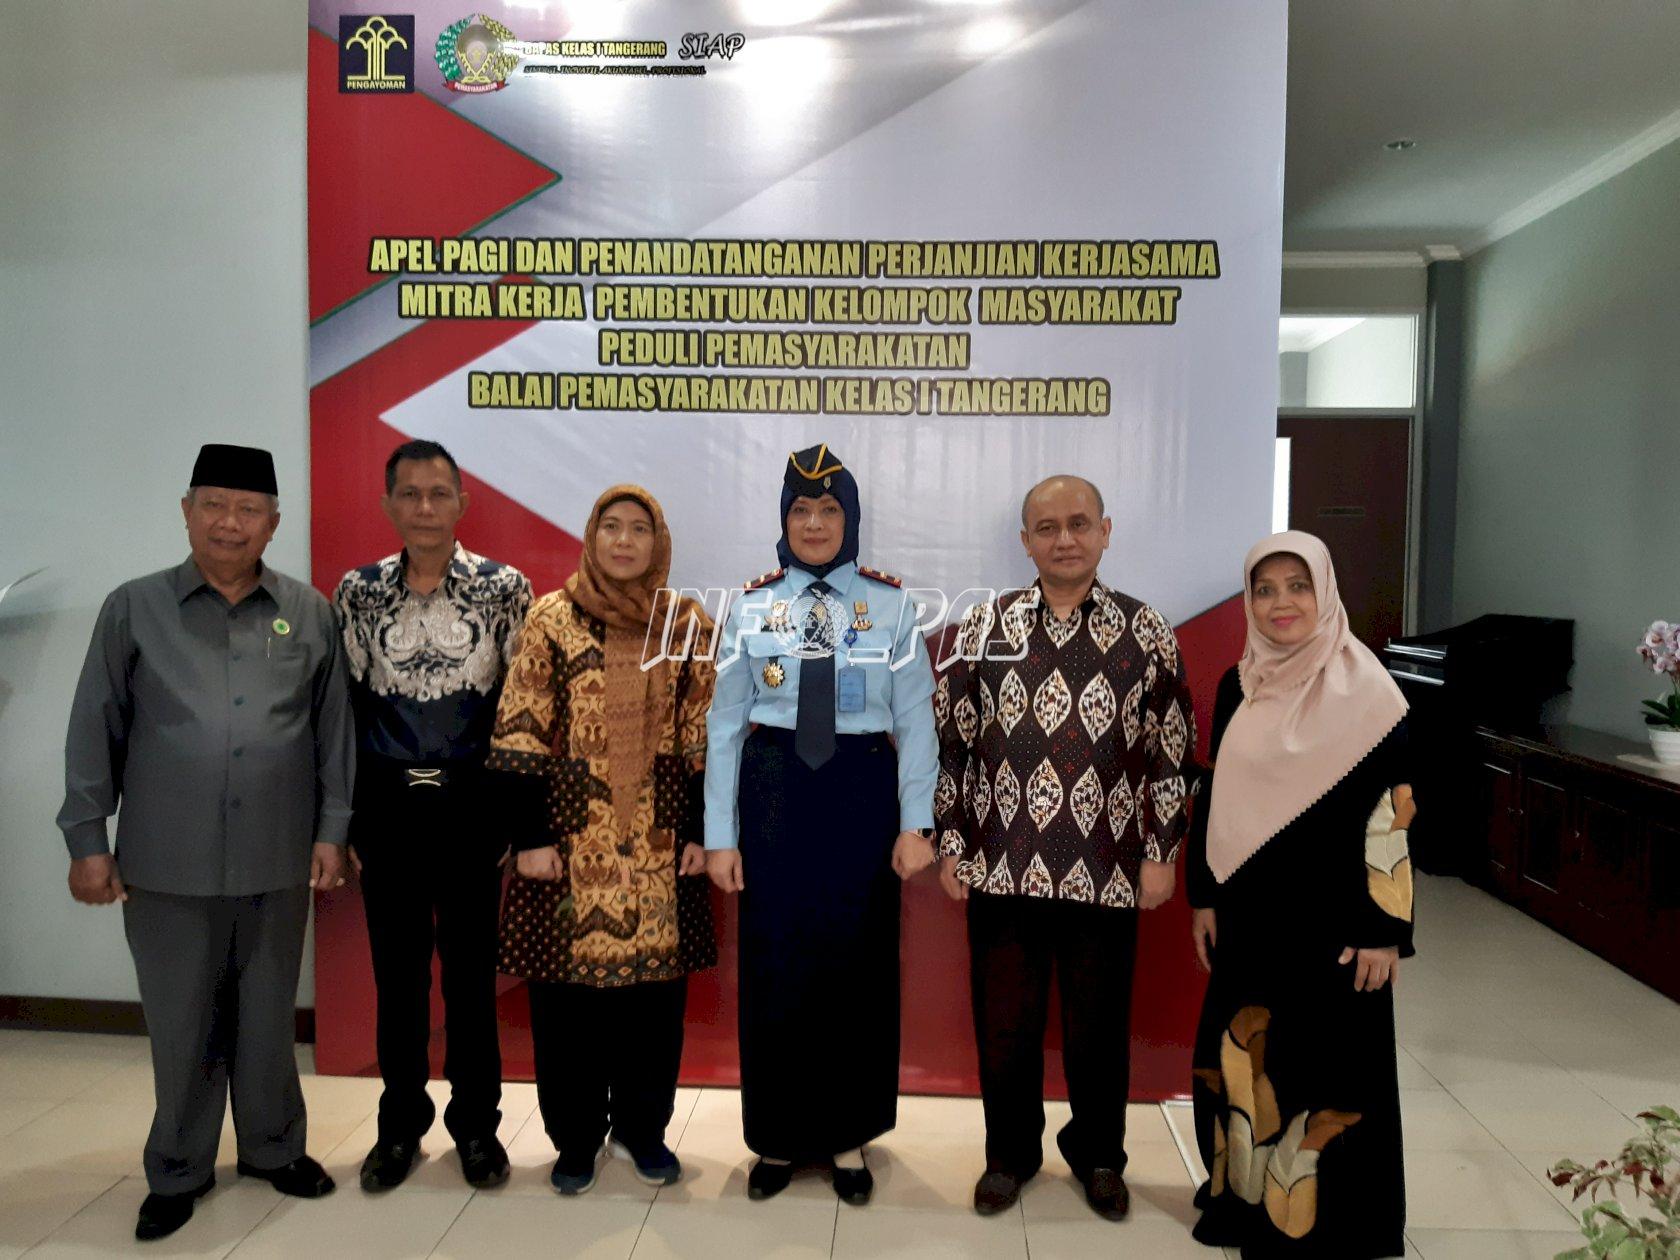 Bapas Tangerang Wujudkan Kerja Sama Pokmas Peduli Pemasyarakatan